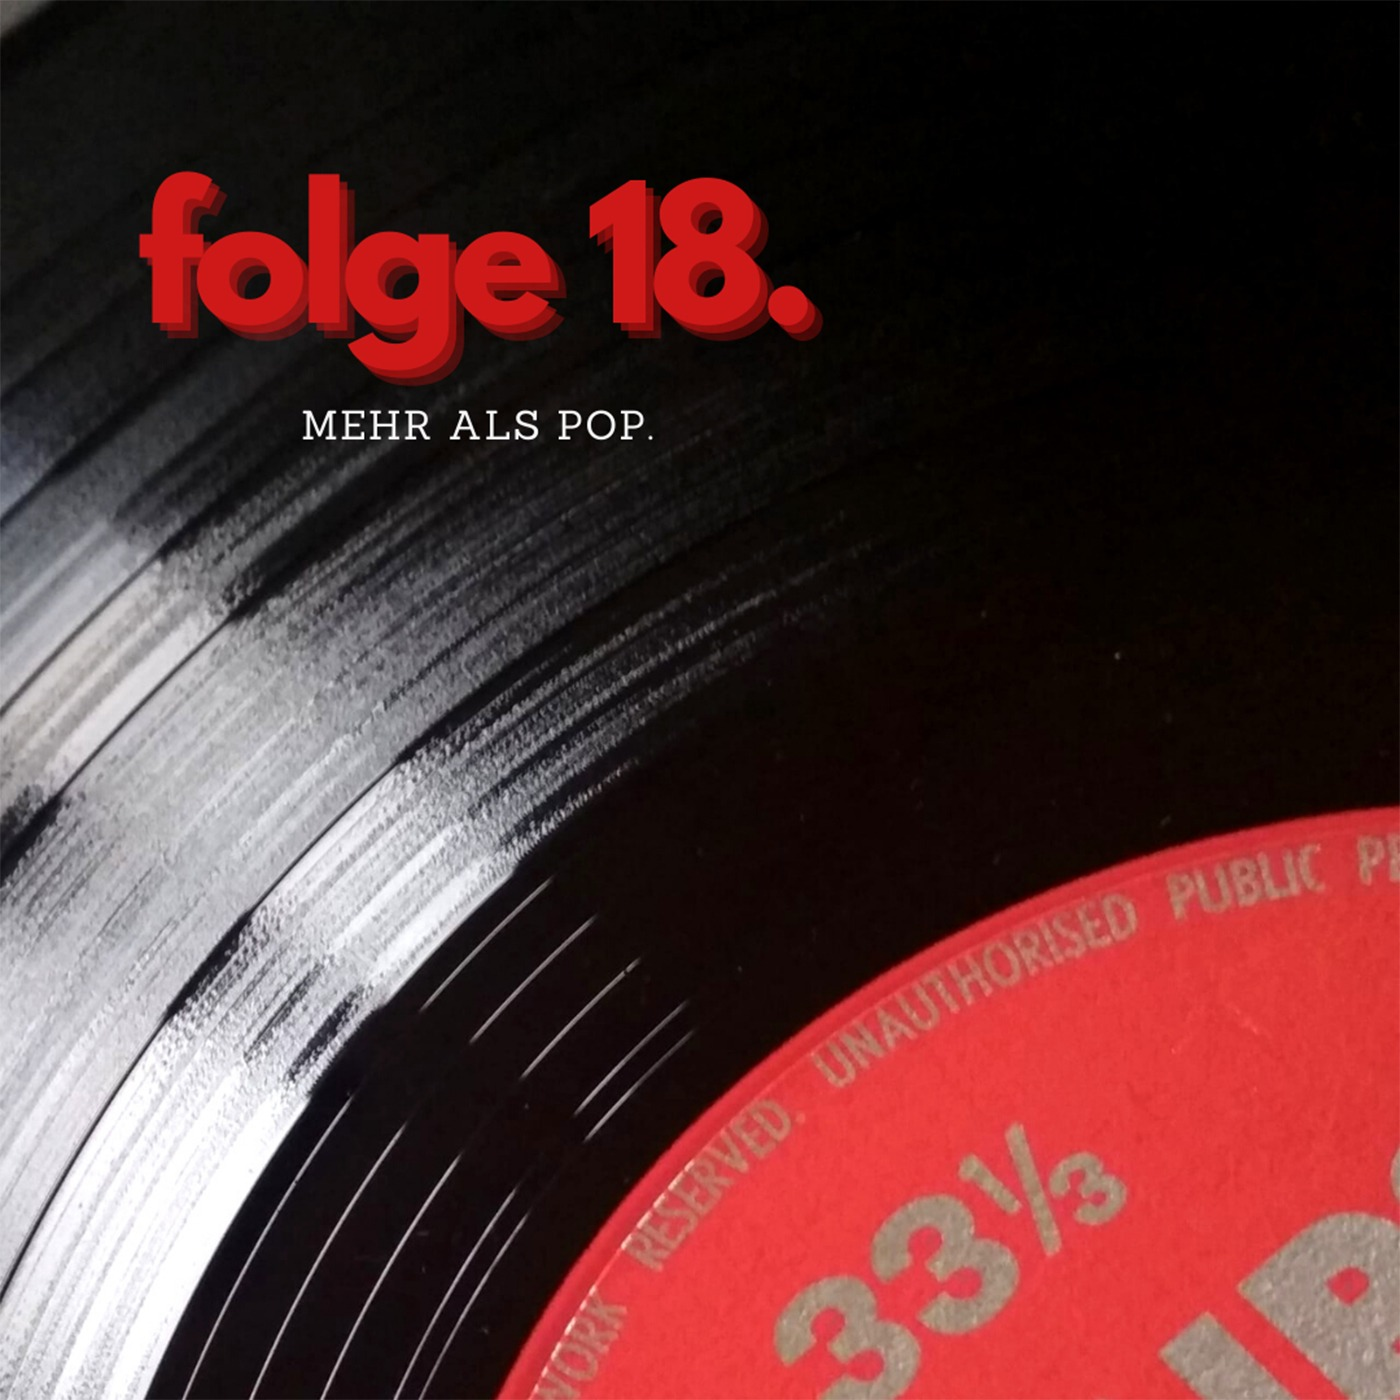 #18 mein musikupdate – Lorde, Amy Winehouse, Prince, Wagner